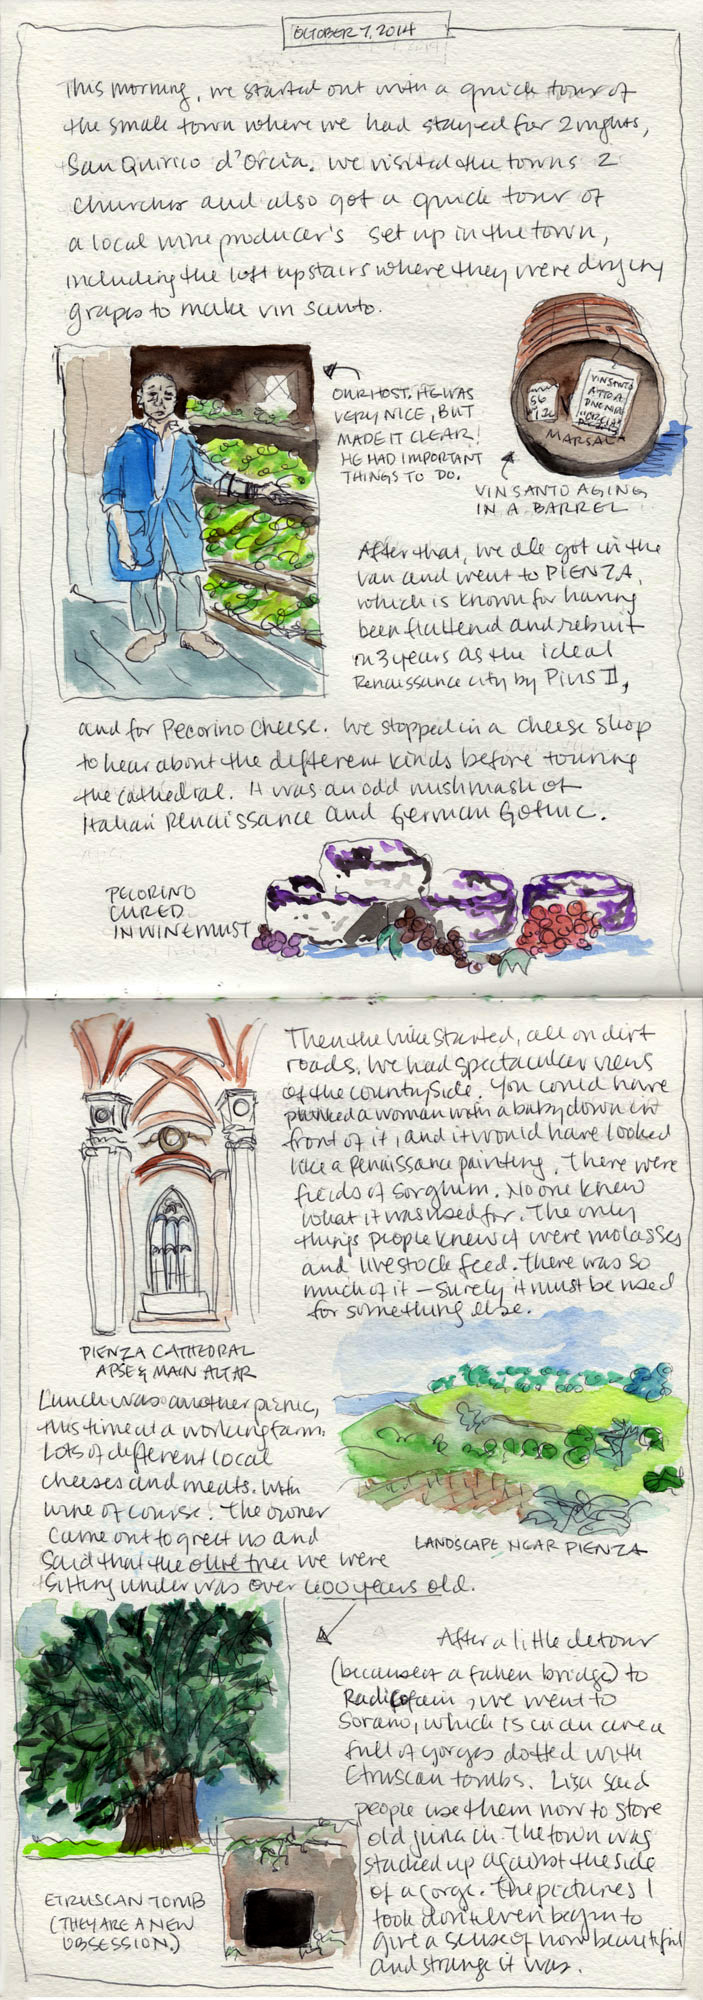 Medieval-Hilltowns-Tuscany-Susanne-Reece-october_7_adj